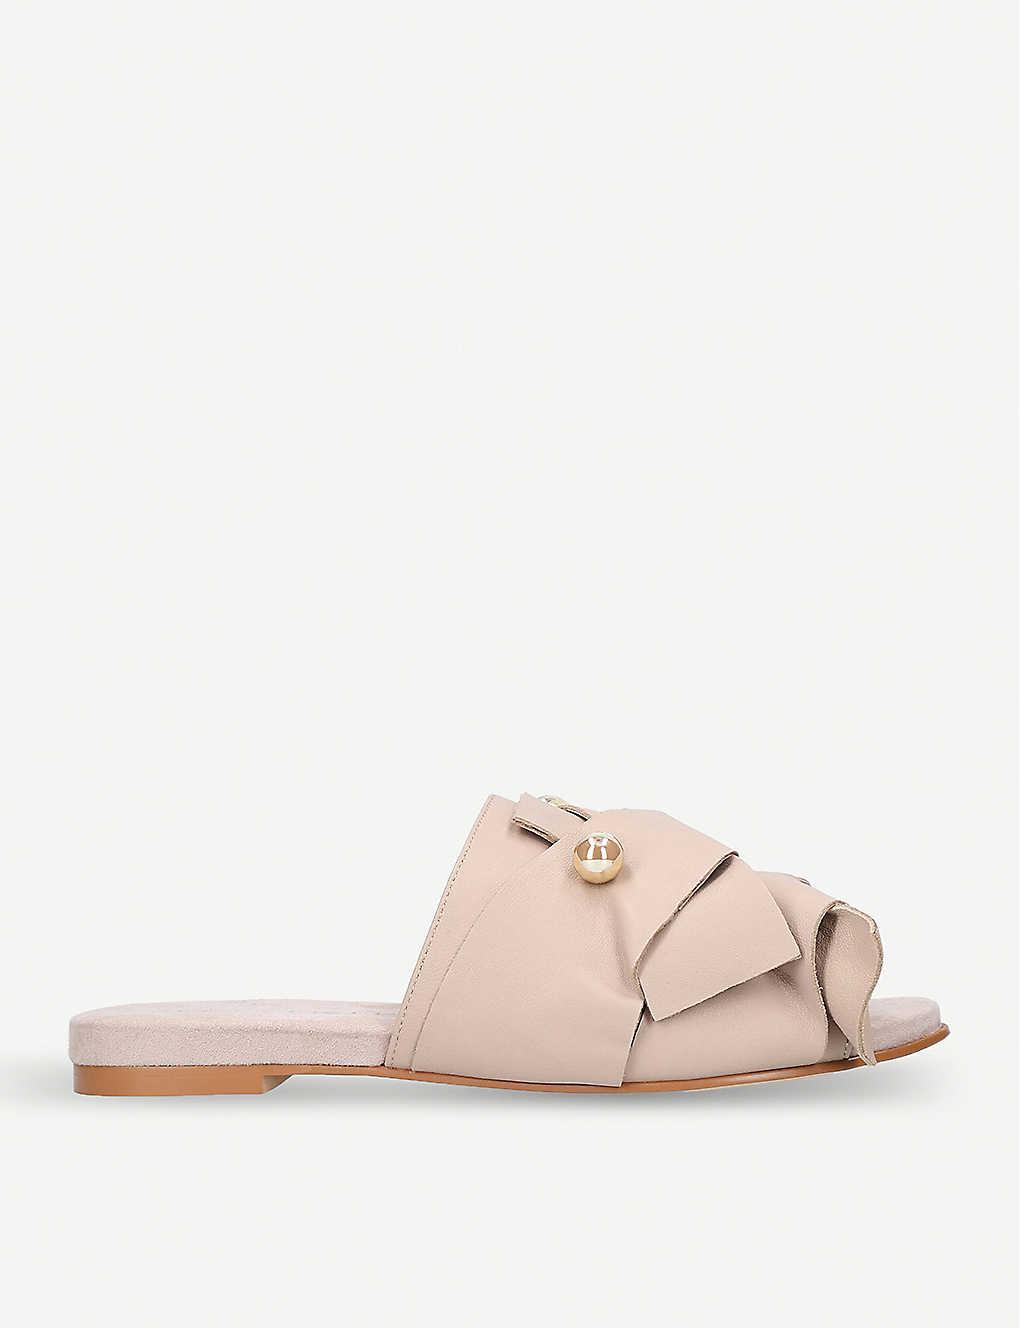 KURT GEIGER LONDON - Naomi embellished suede flat mules